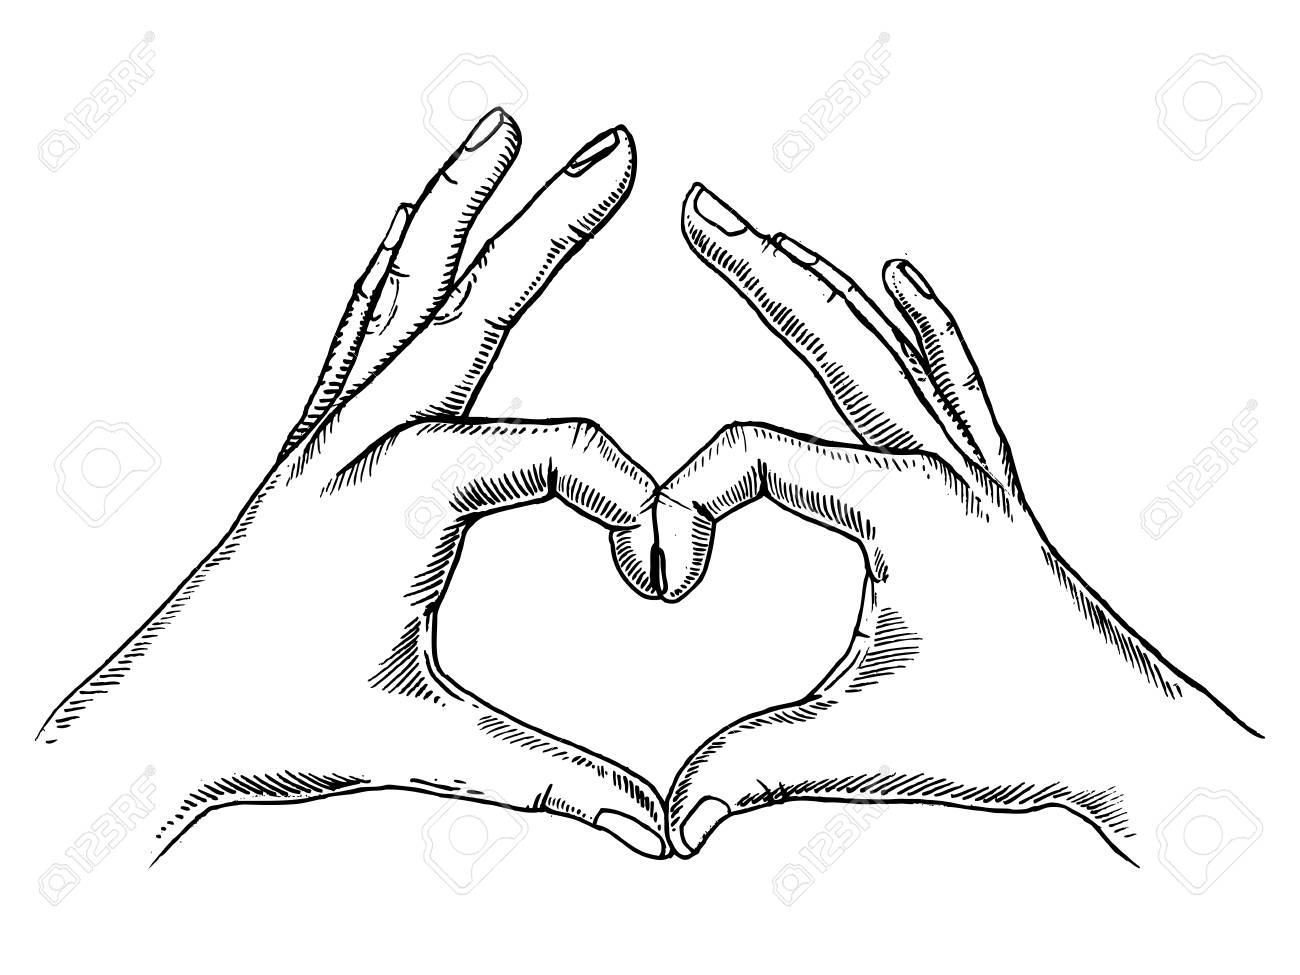 Hands making heart sign..